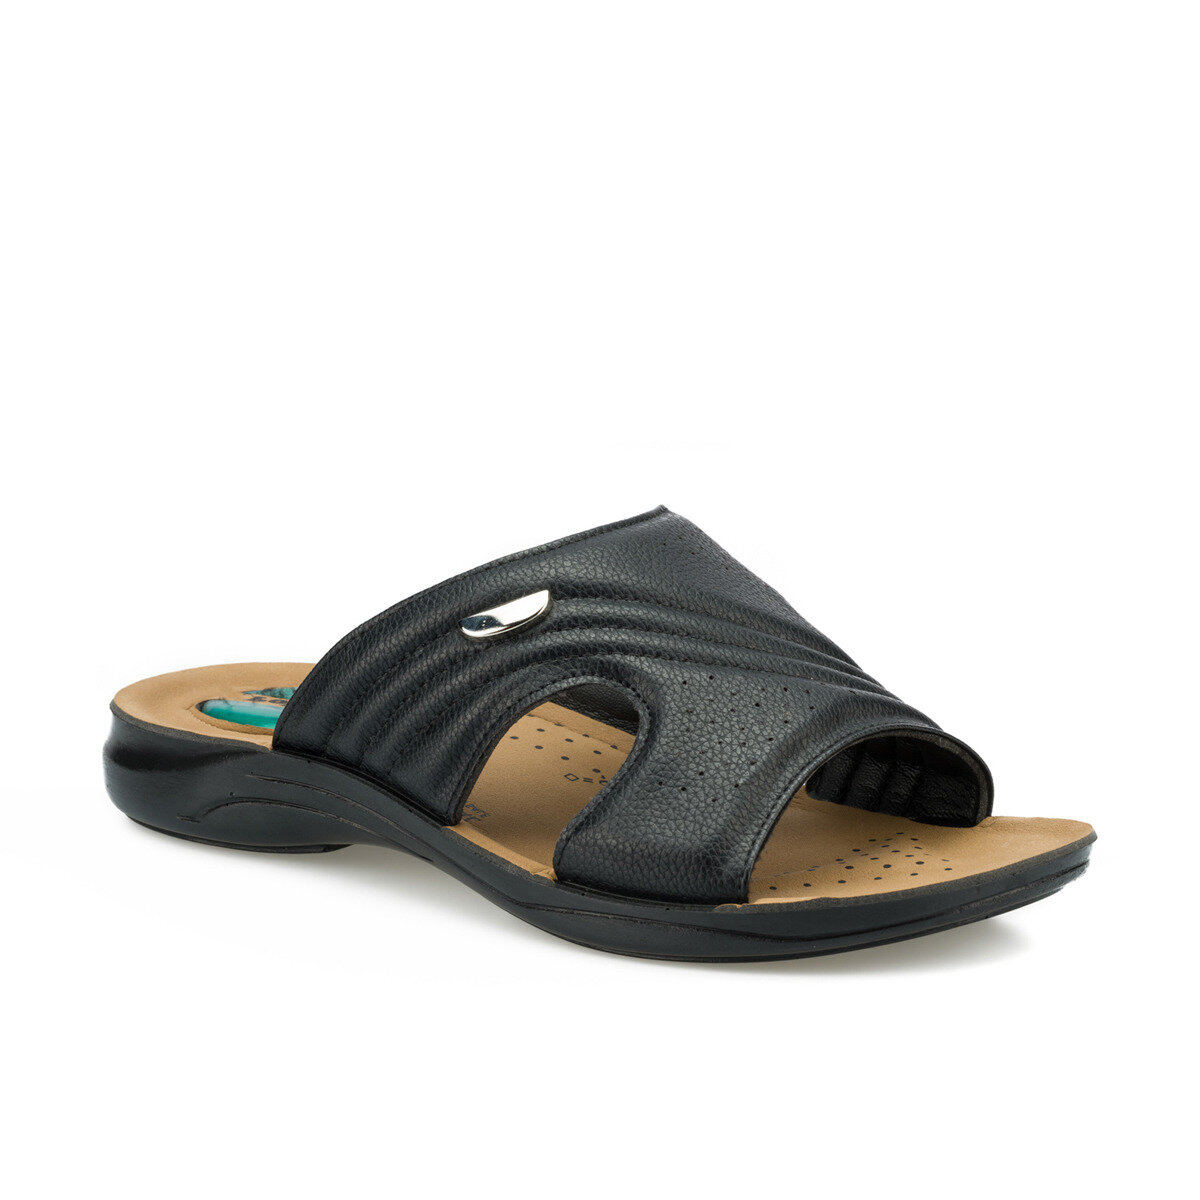 FLO 160270.M Black Male Slippers Polaris